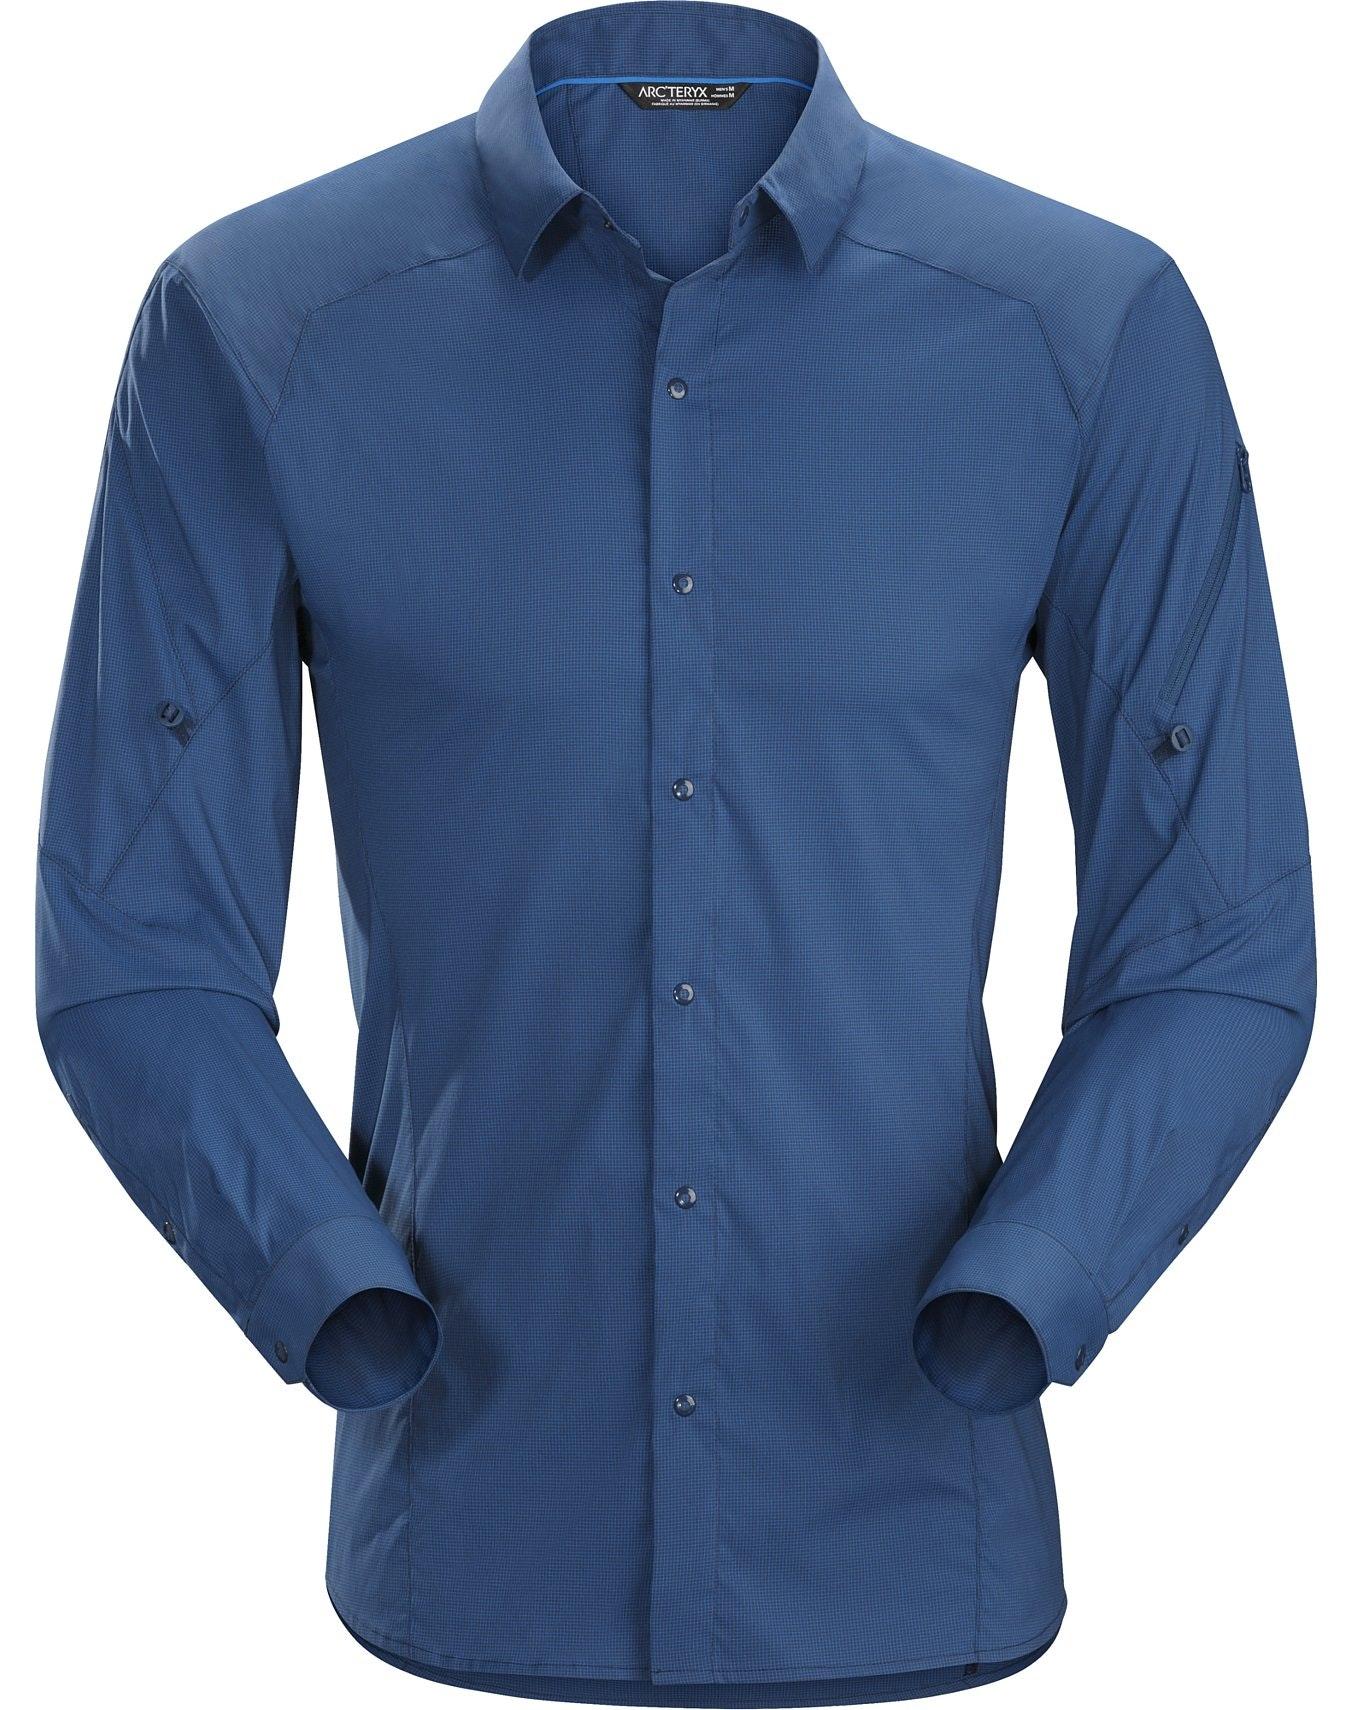 Elaho Shirt Ls Mens Arcteryx